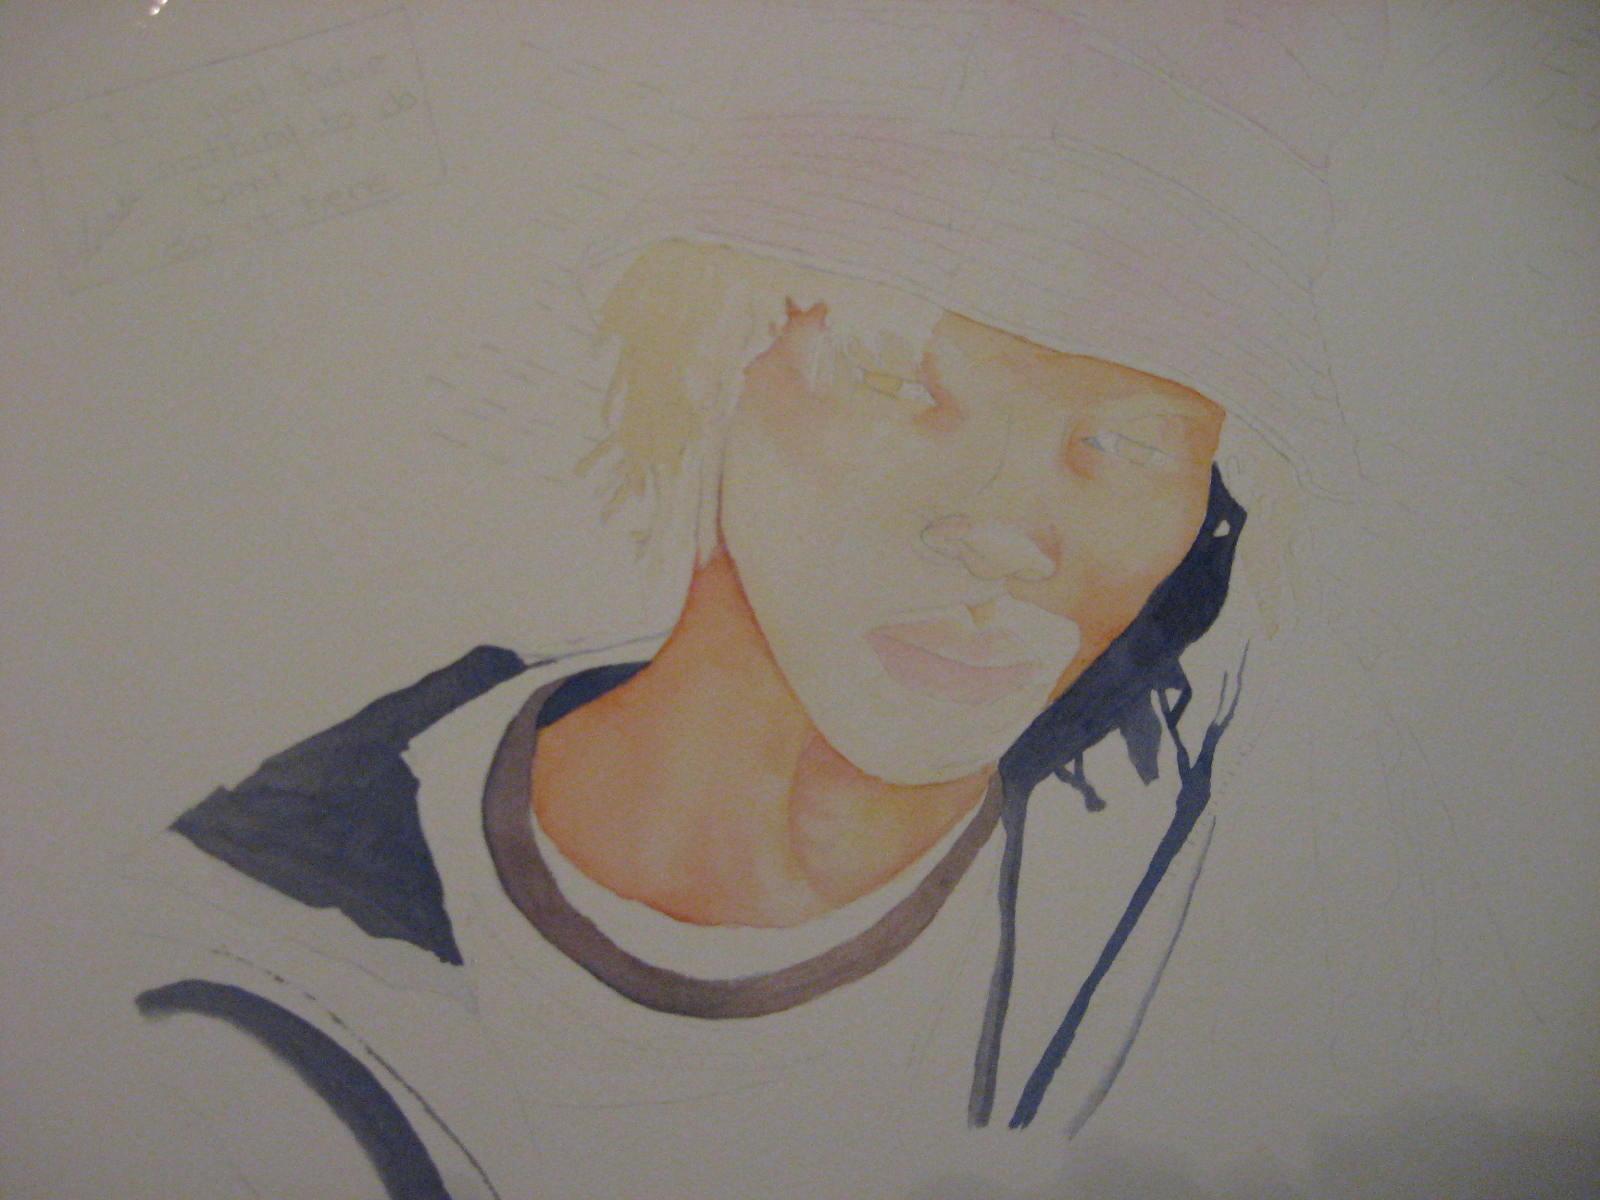 hanging out watercolor portrait tutorial